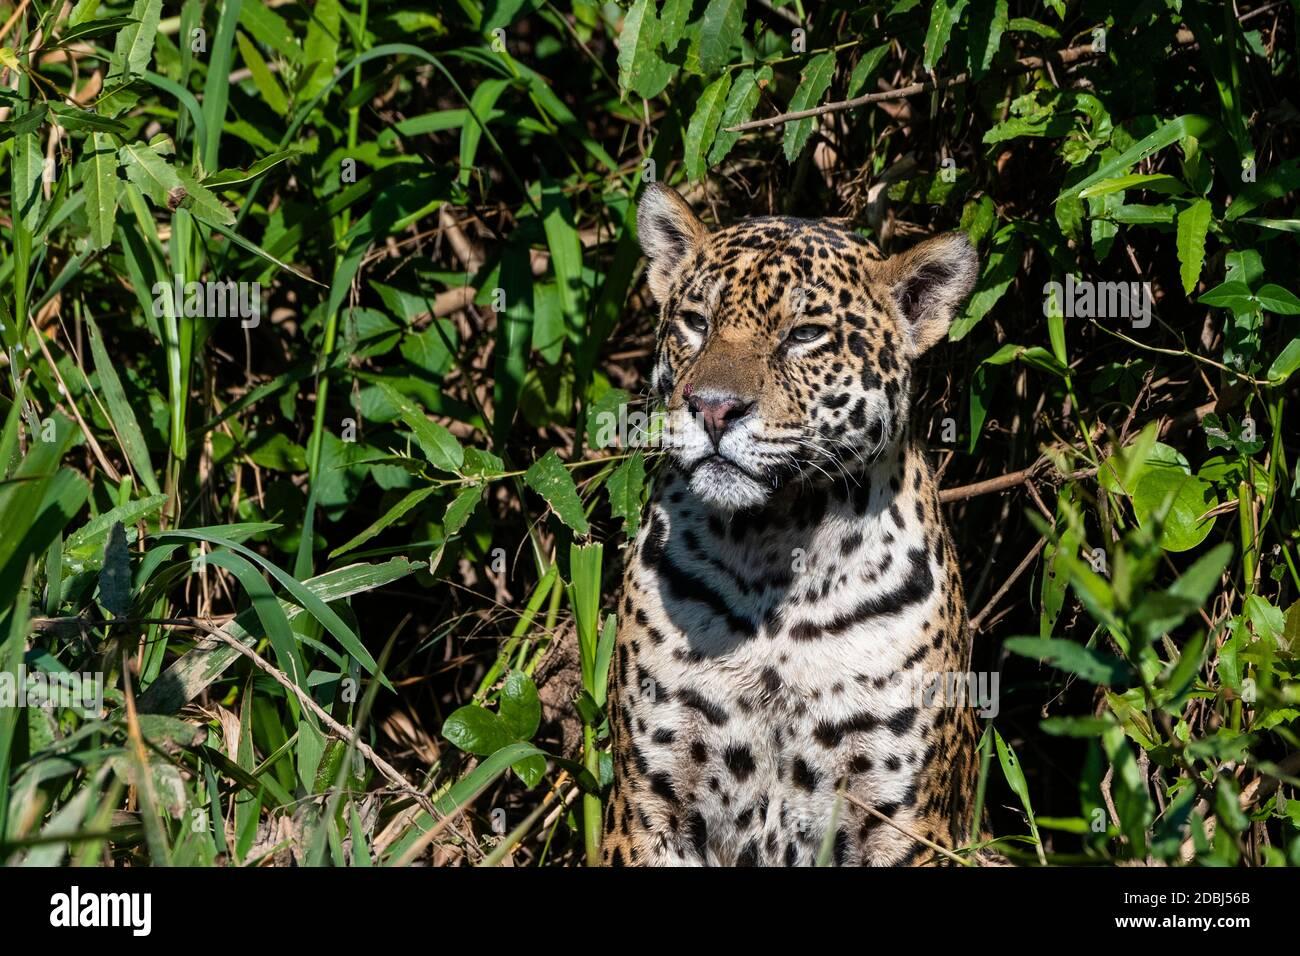 Jaguar (Panthera onca), Pantanal, Mato Grosso, Brasile, Sud America Foto Stock